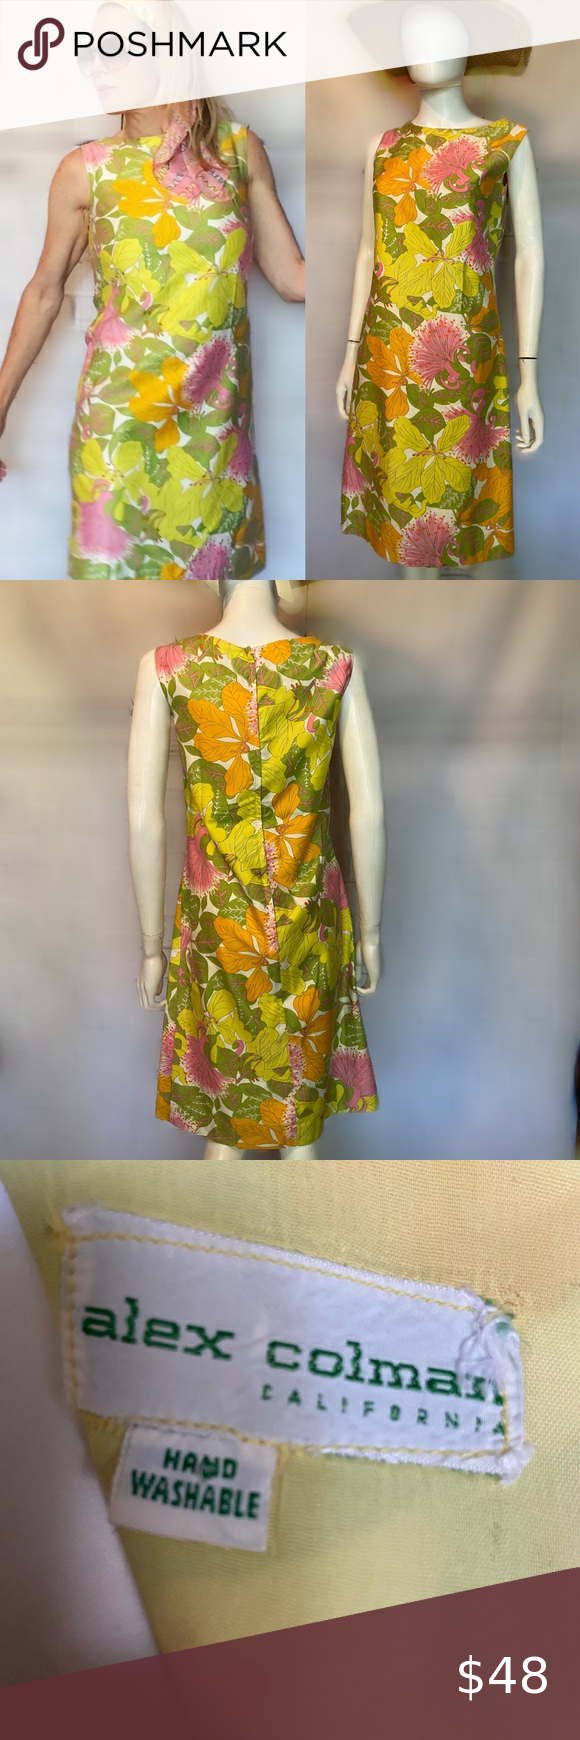 Vintage Floral Cotton Mod Shift Dress Vintage Shift Dress Shift Dress Dresses [ 1740 x 580 Pixel ]